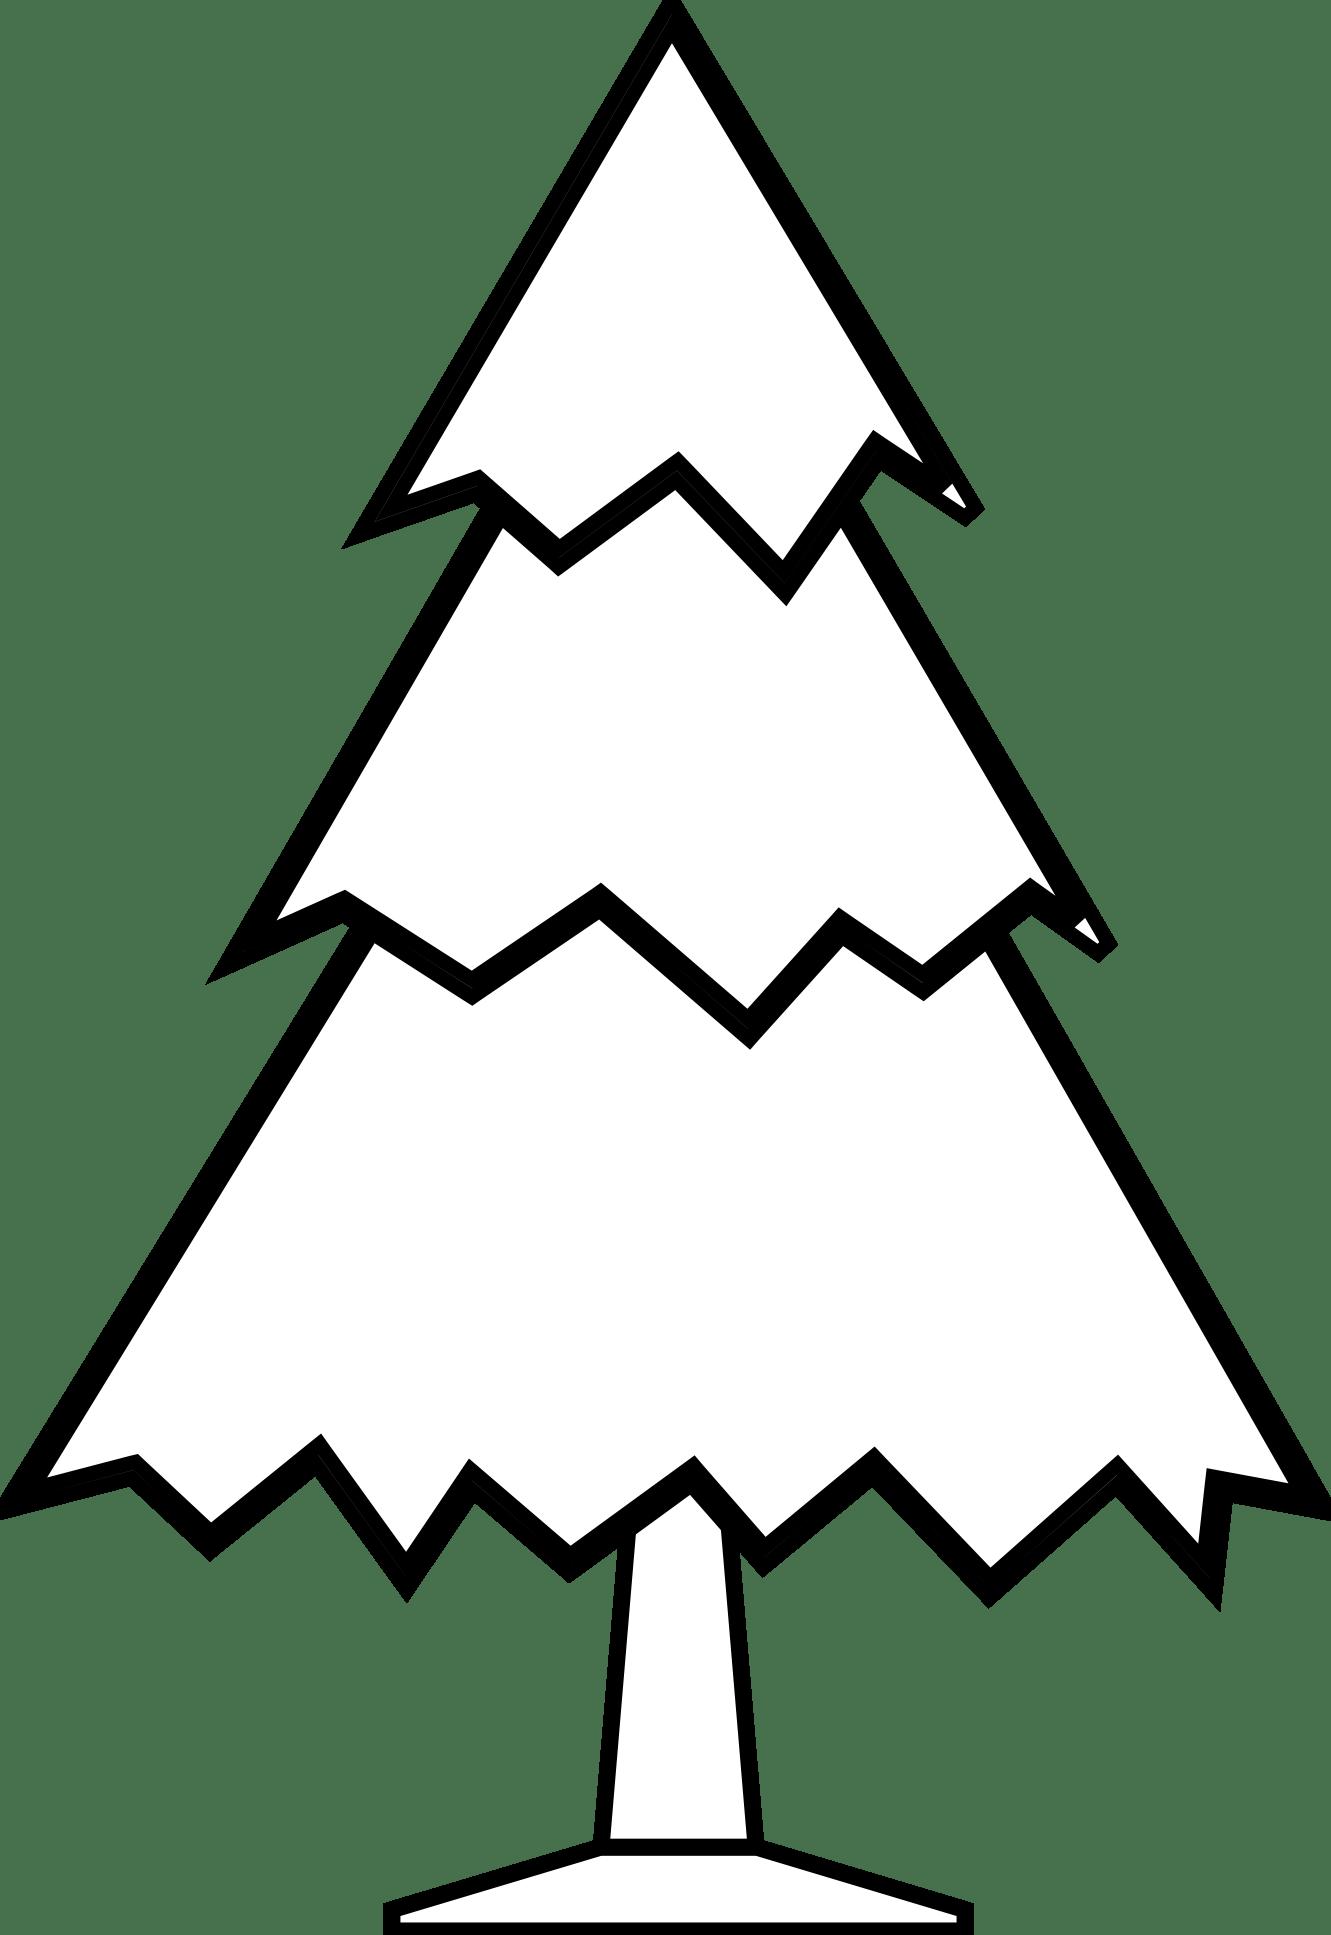 Black And White Family Tree Clipart Clipart Panda